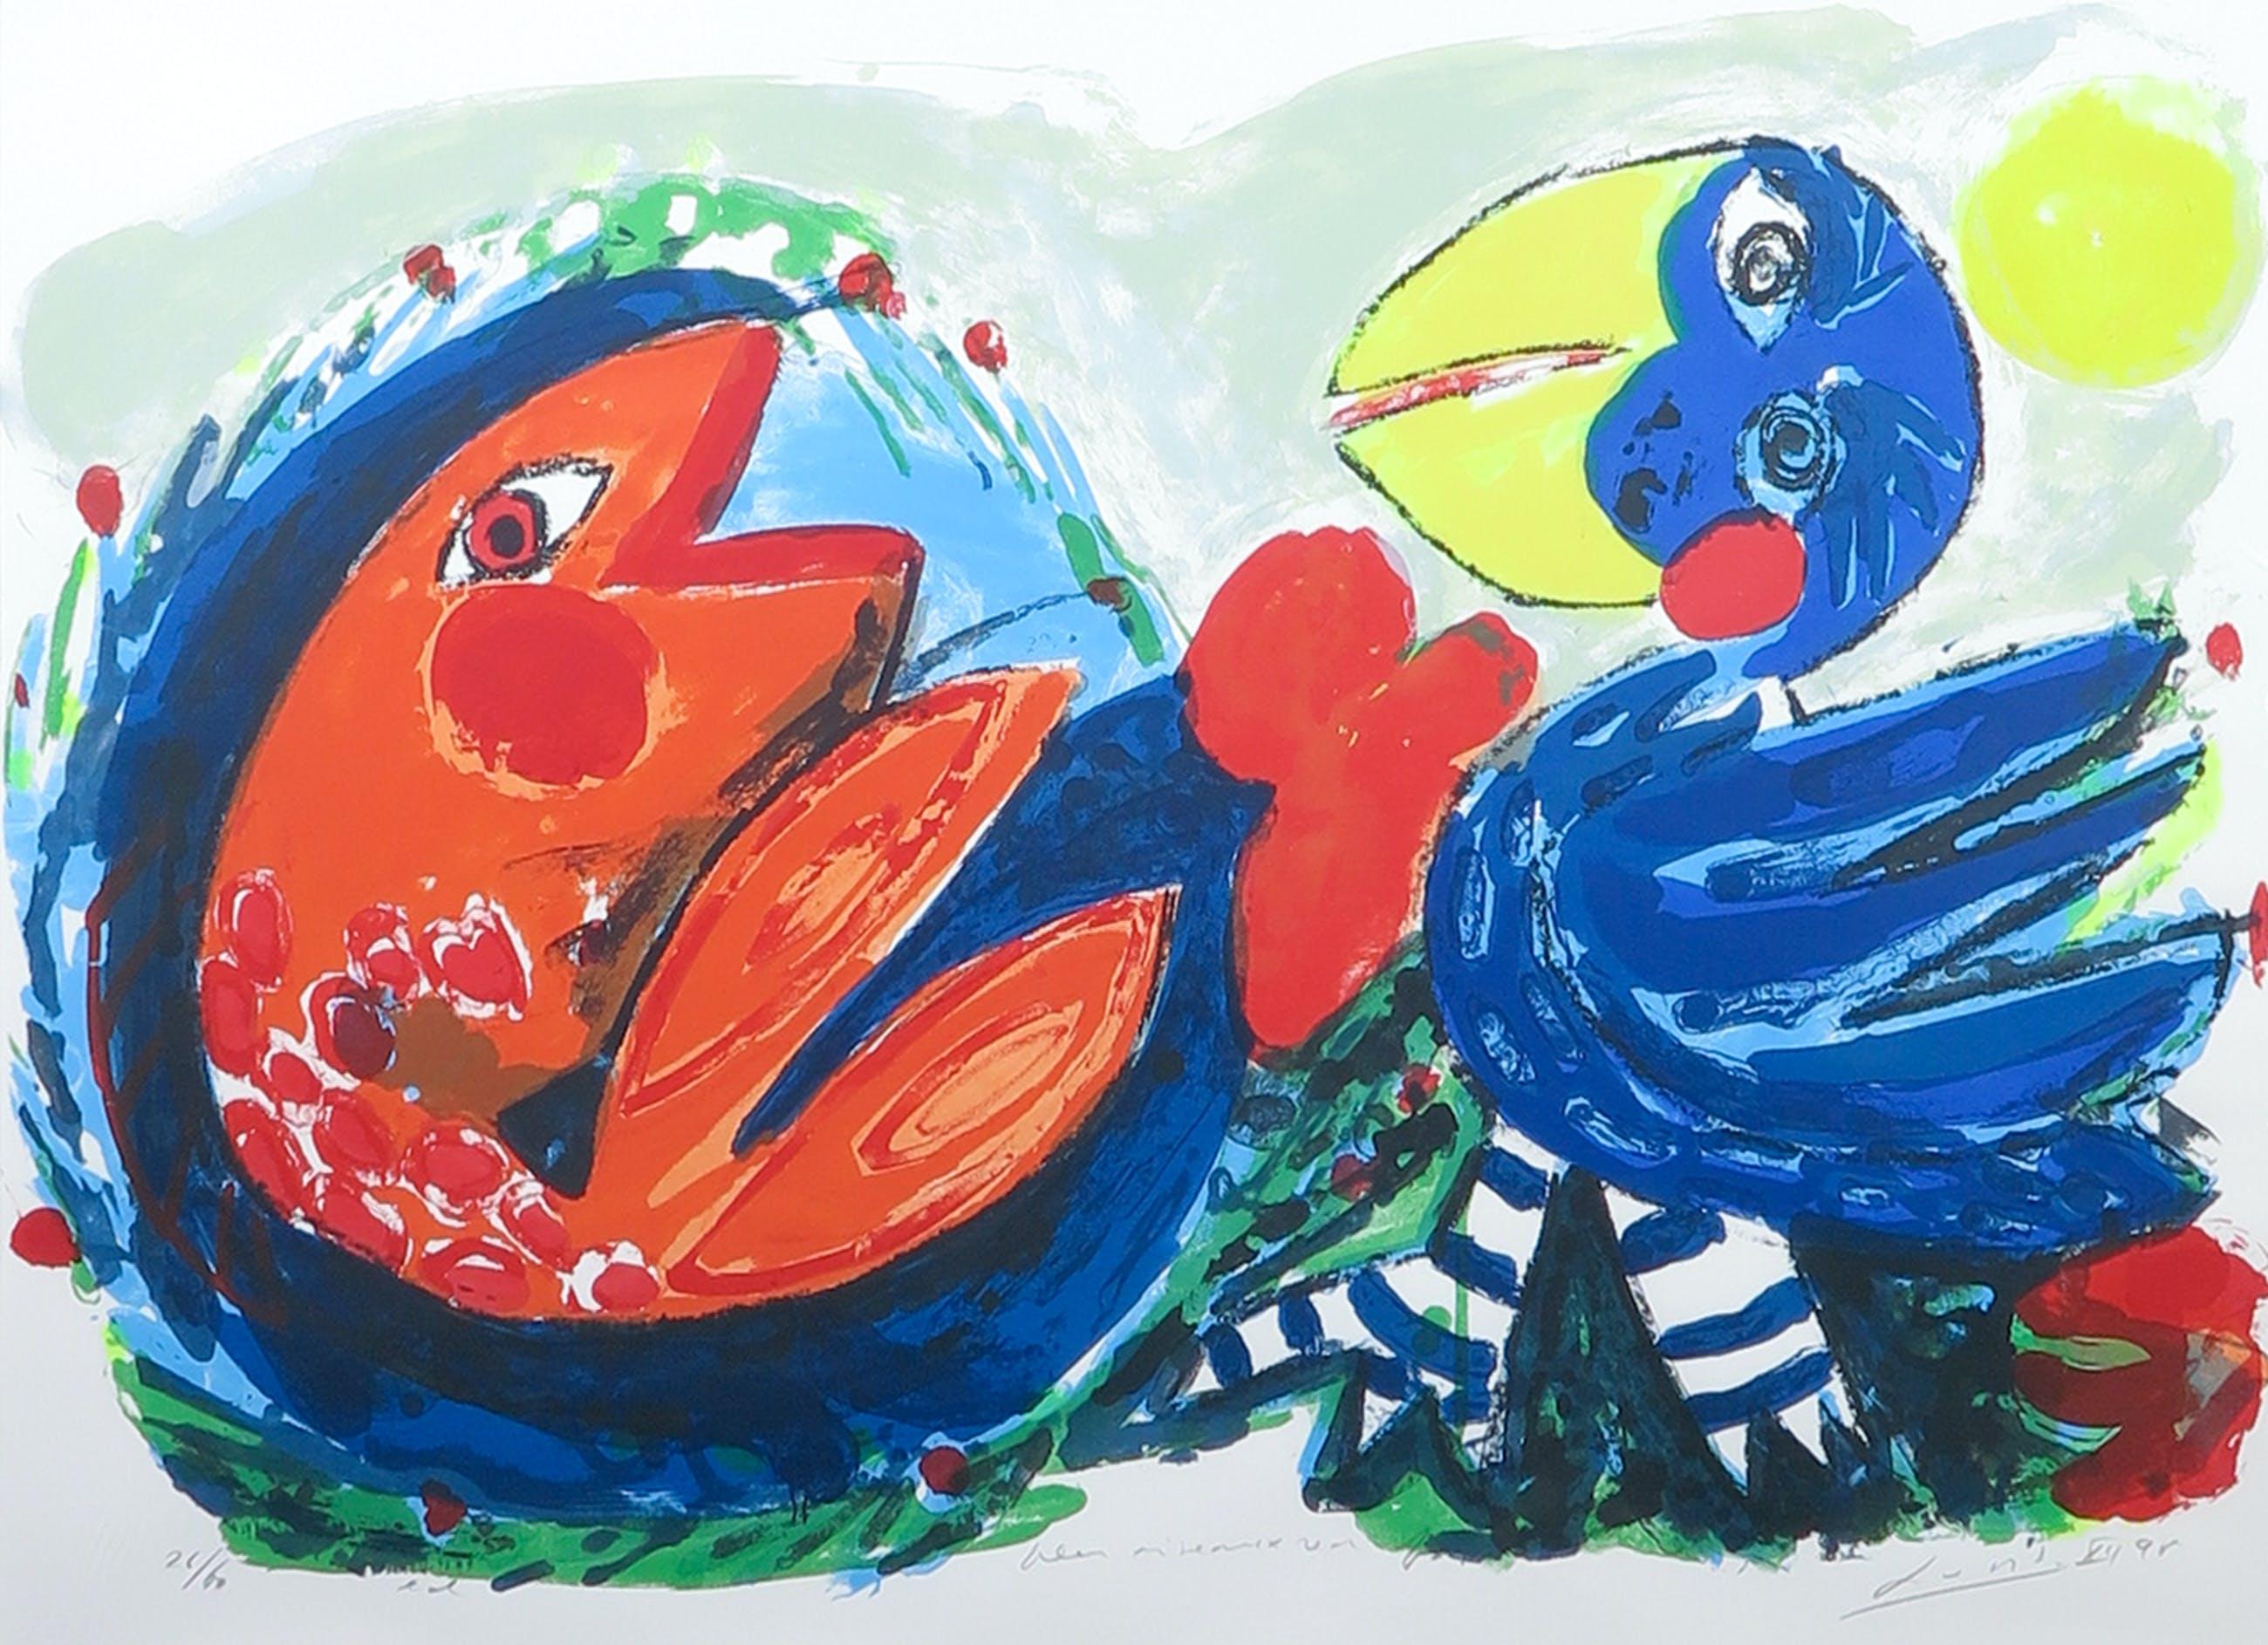 John Lie a Fo - Zeefdruk, Bleu oiseaux red fish - Ingelijst kopen? Bied vanaf 30!